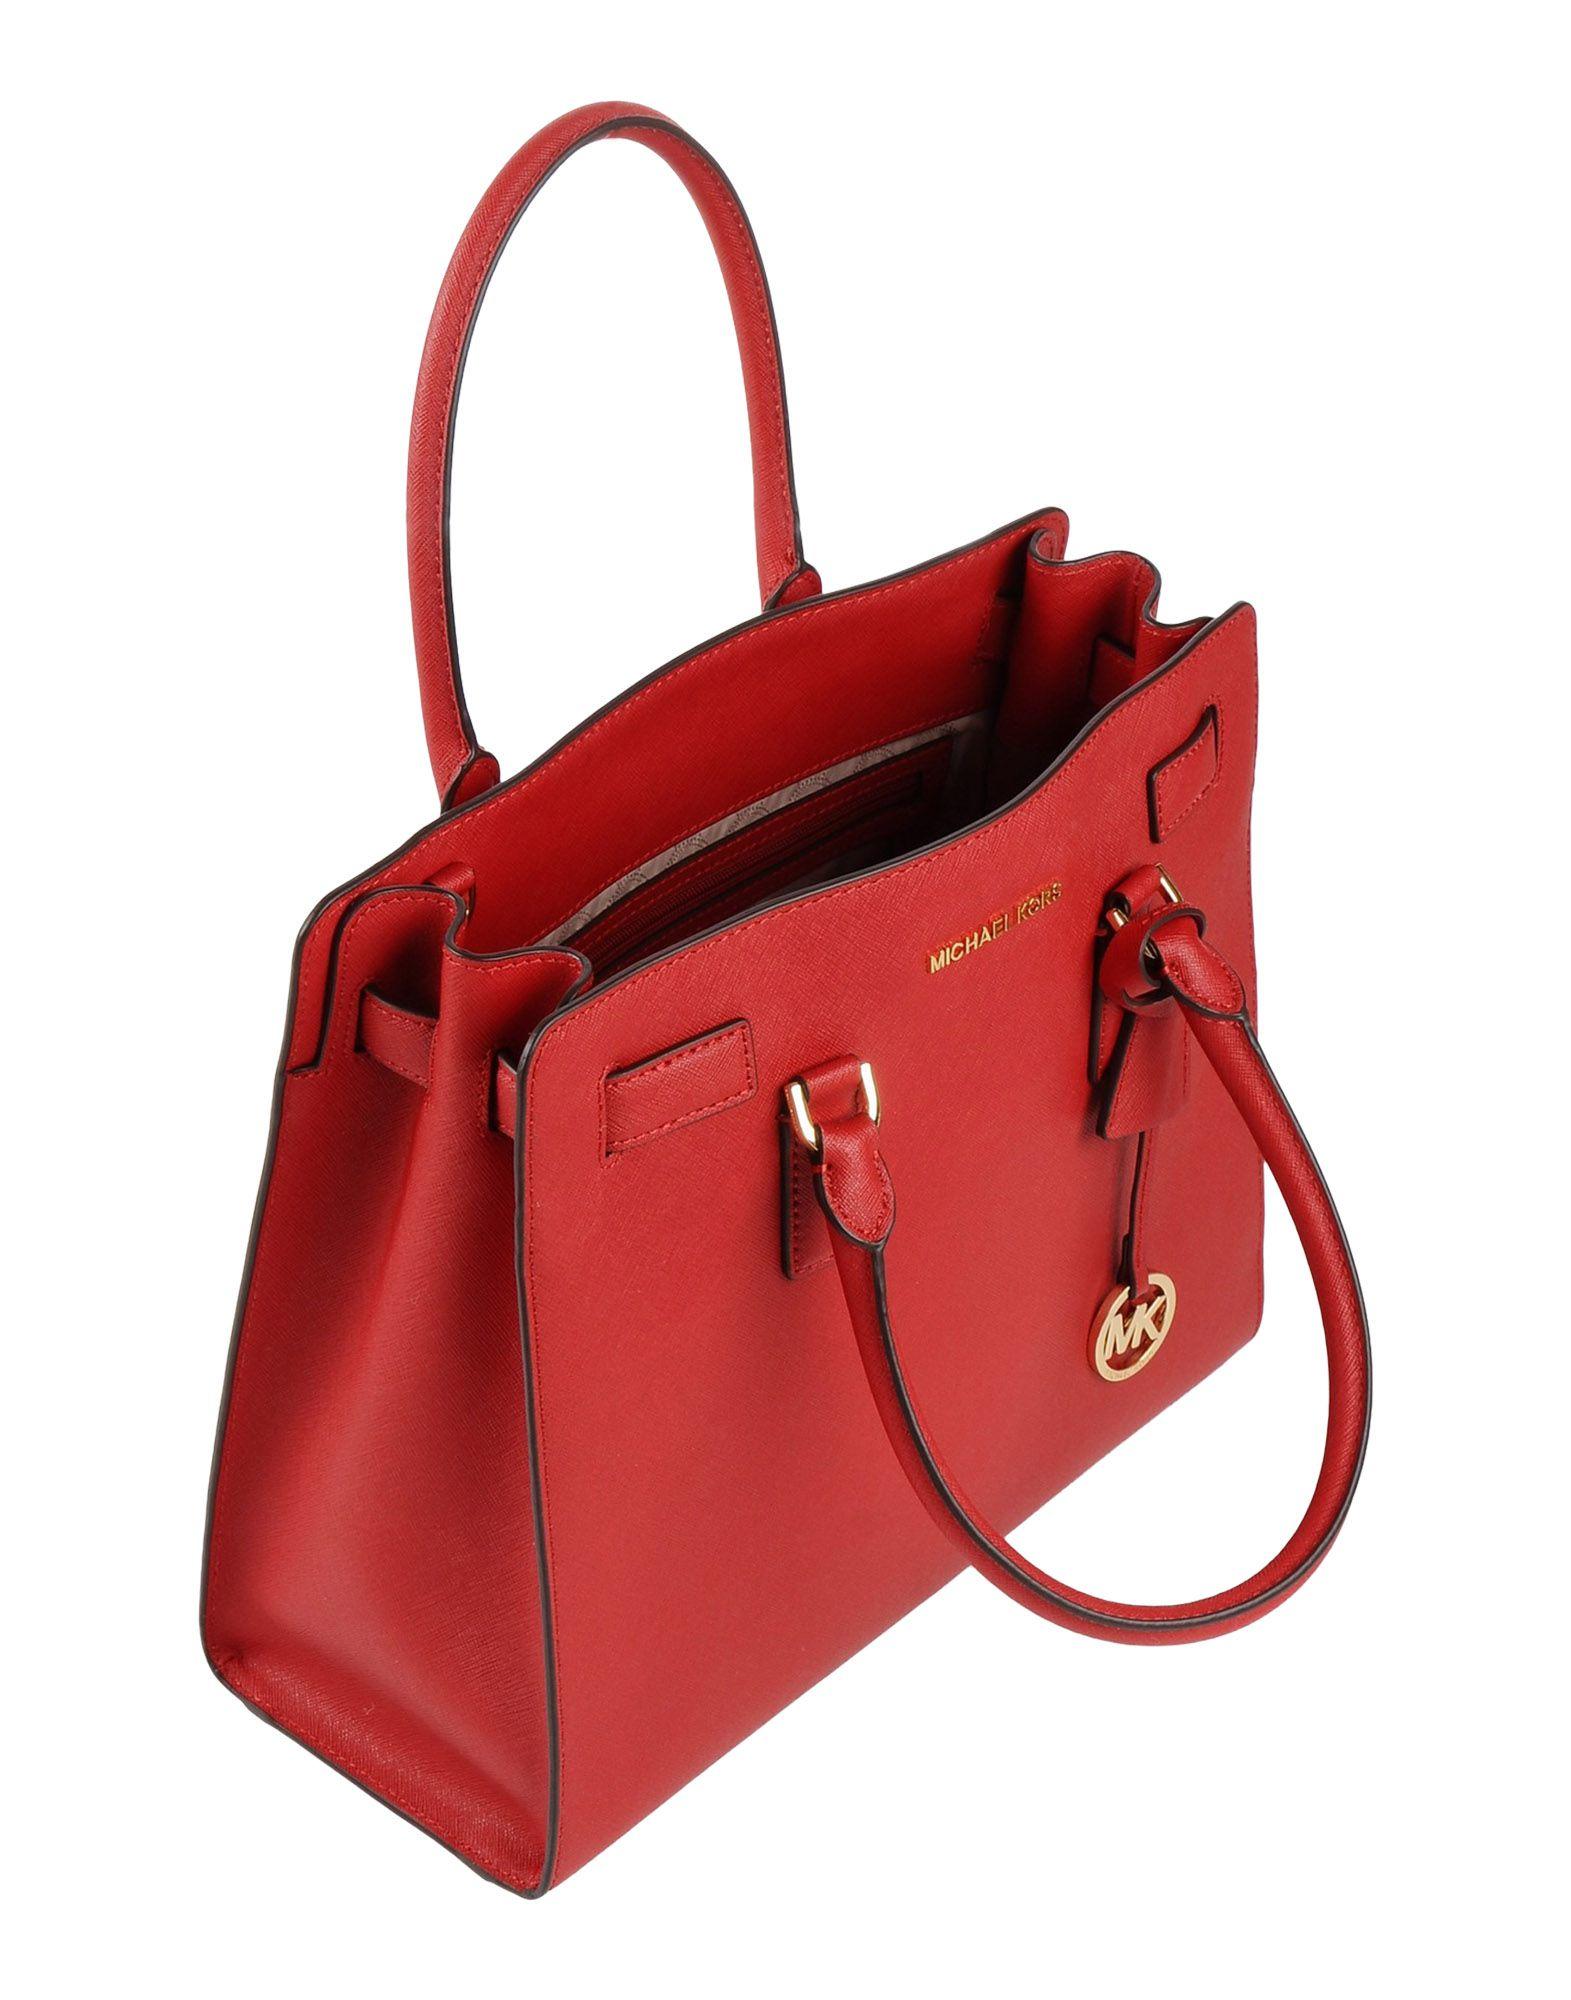 ff7bb1ea286b MICHAEL Michael Kors Handbag in Red - Lyst